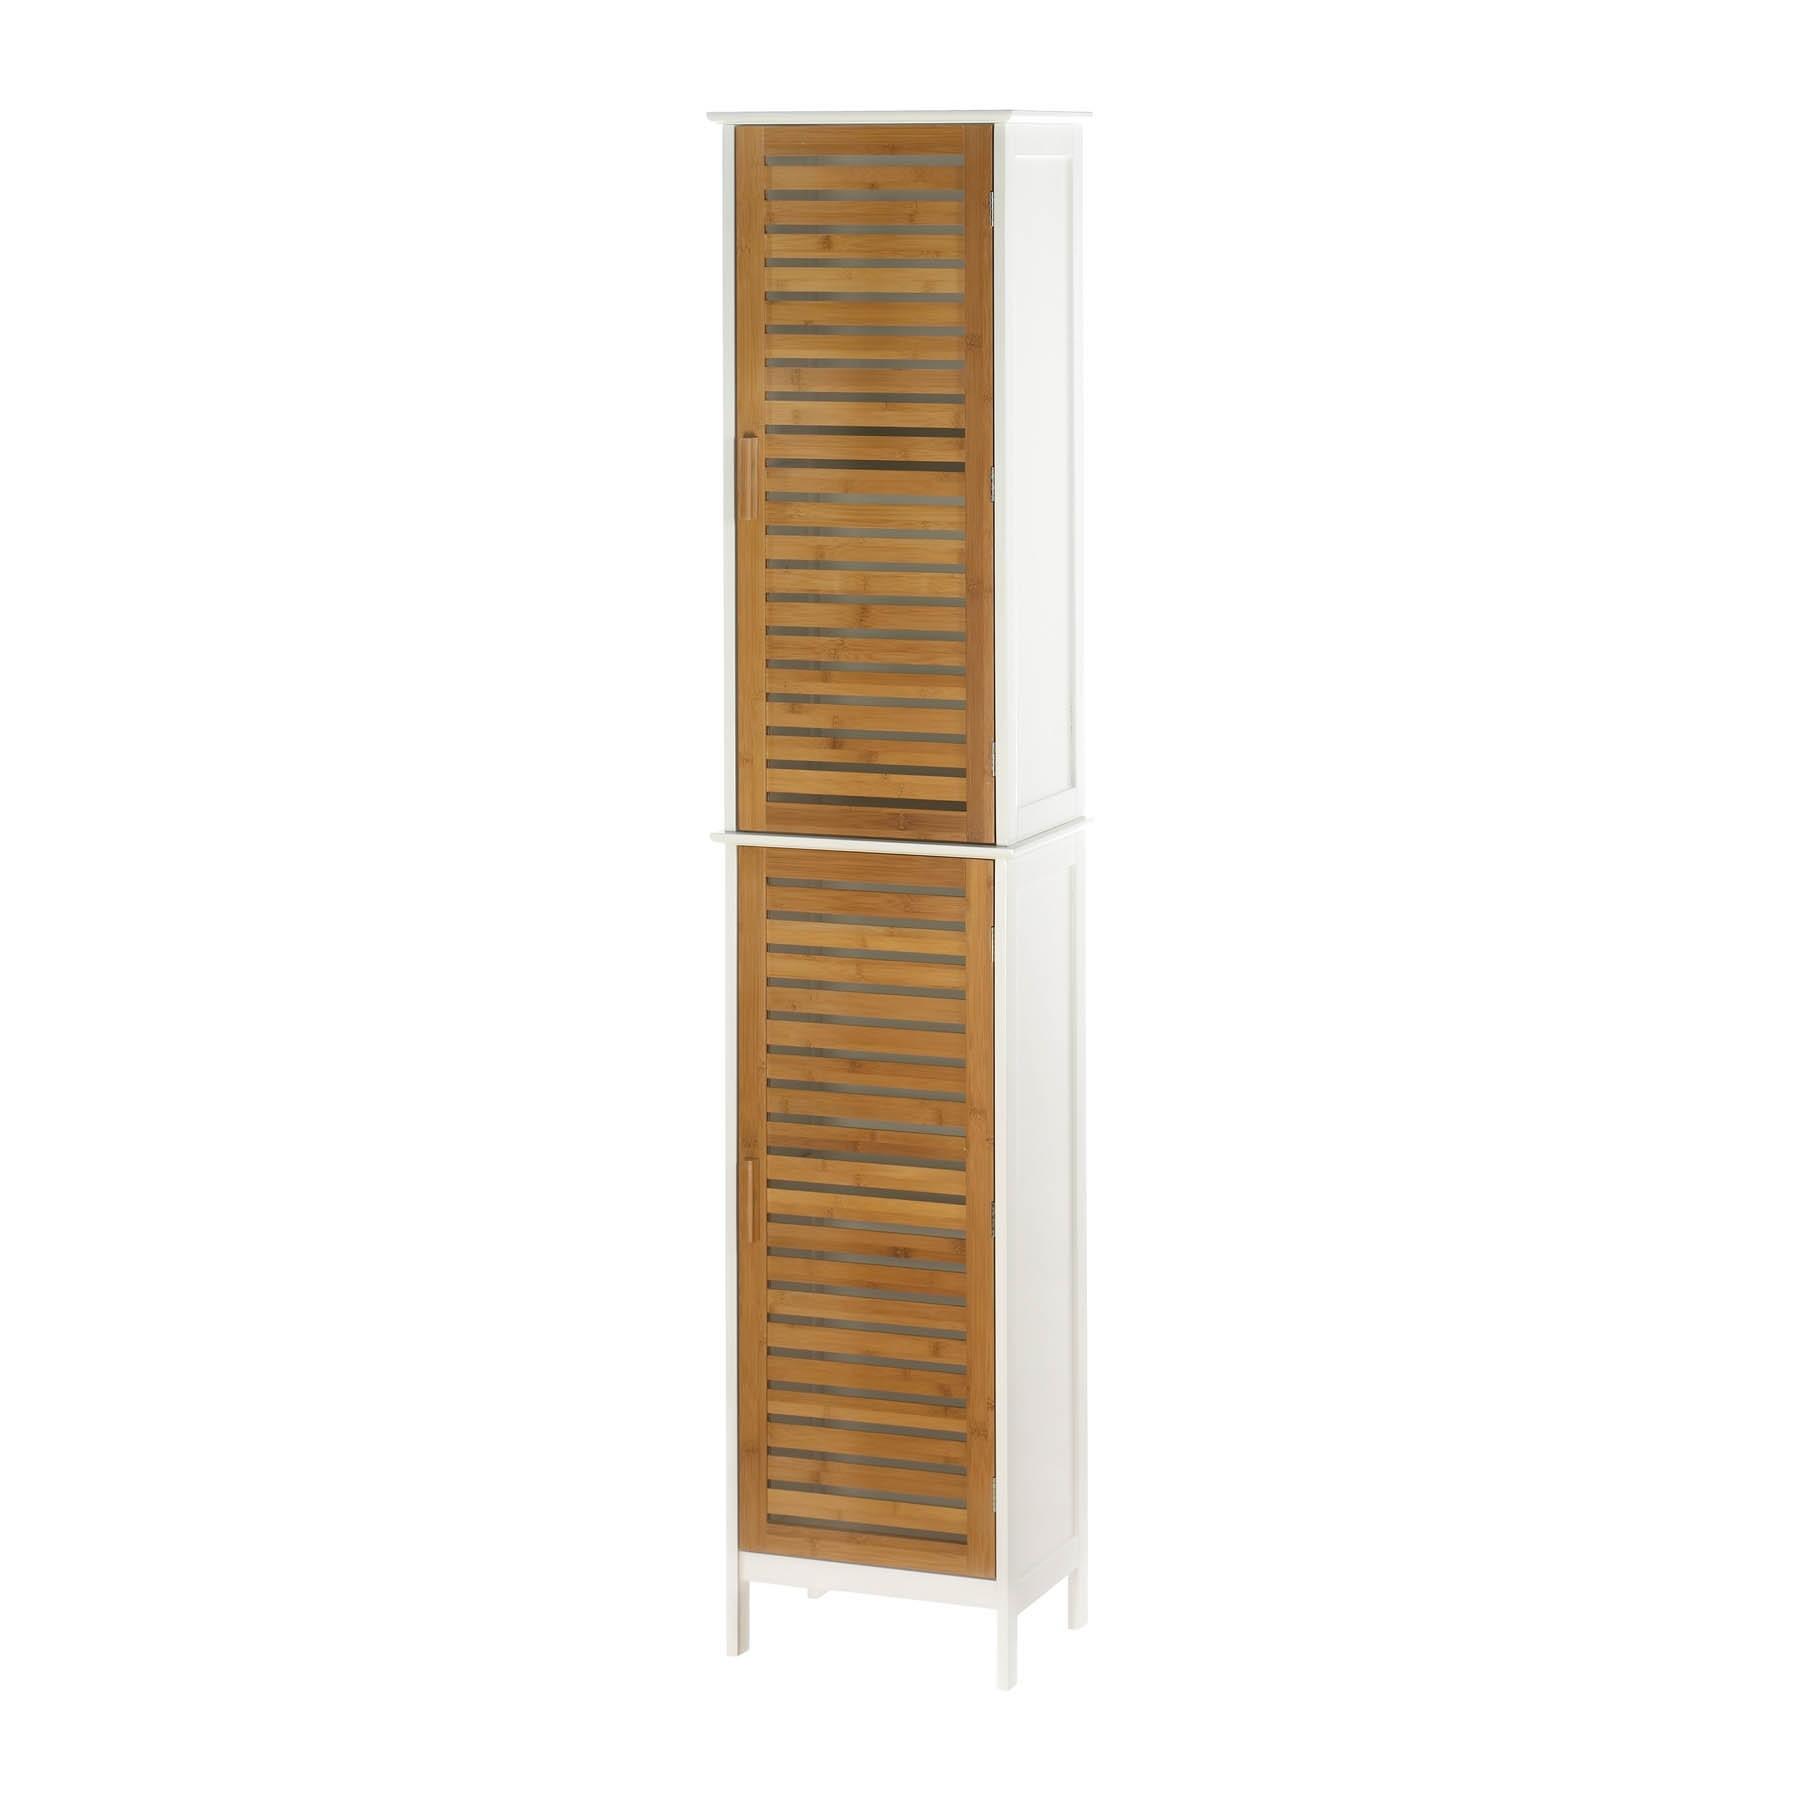 tall narrow storage cabinet ideas on foter rh foter com tall thin storage cabinet living room tall narrow storage cabinets with doors